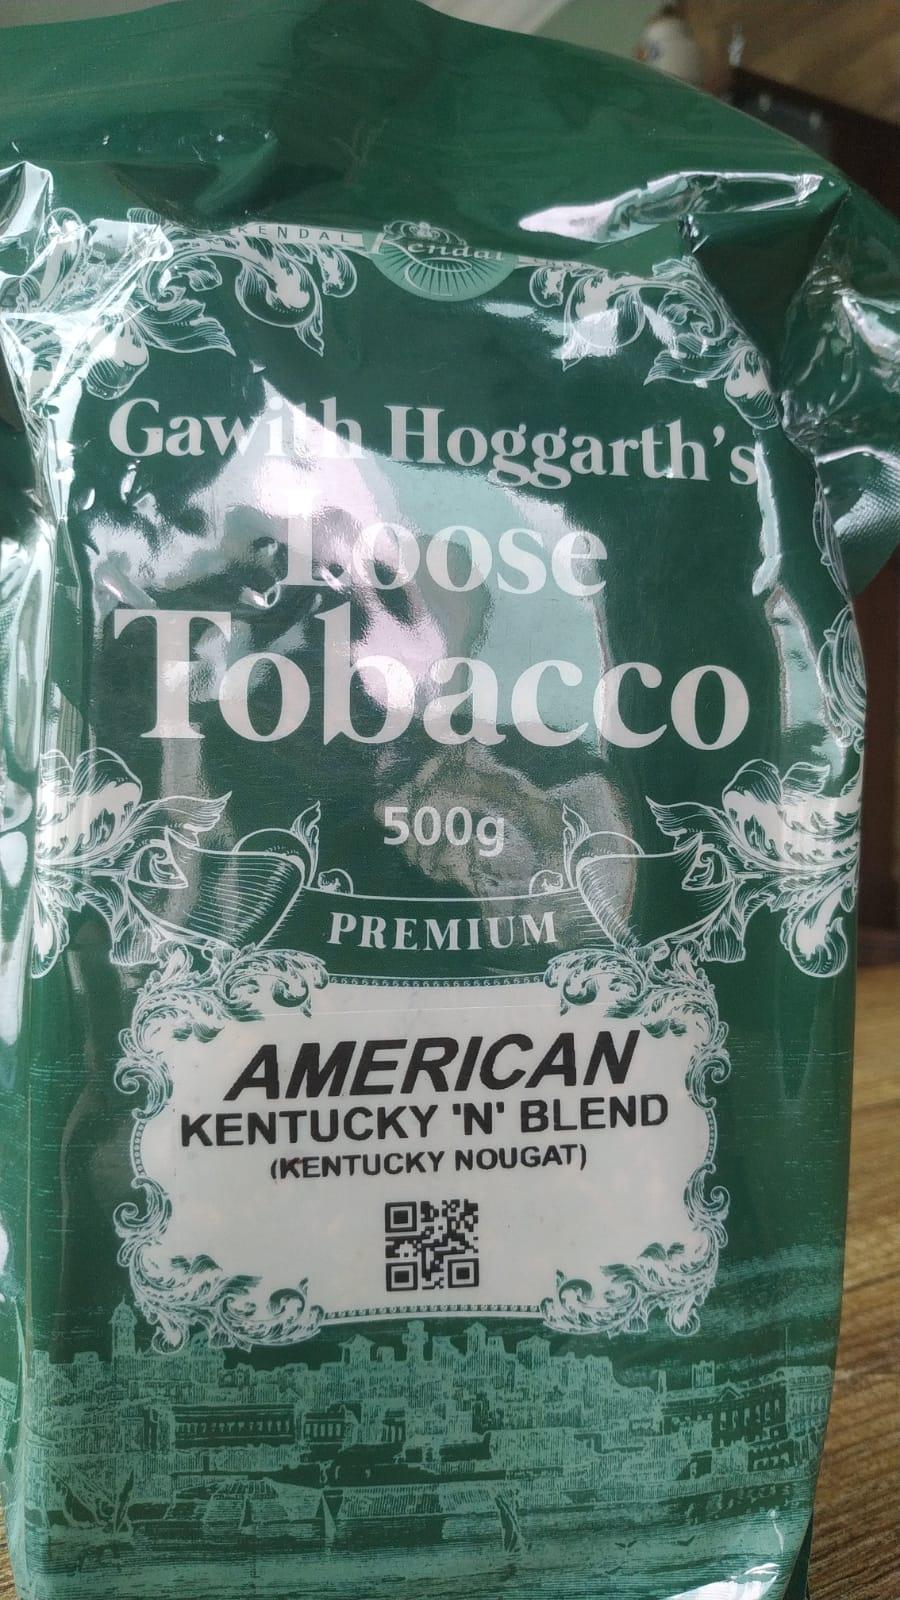 Gawith, Hoggarth & Co. - Kentucky Nougat - 50g